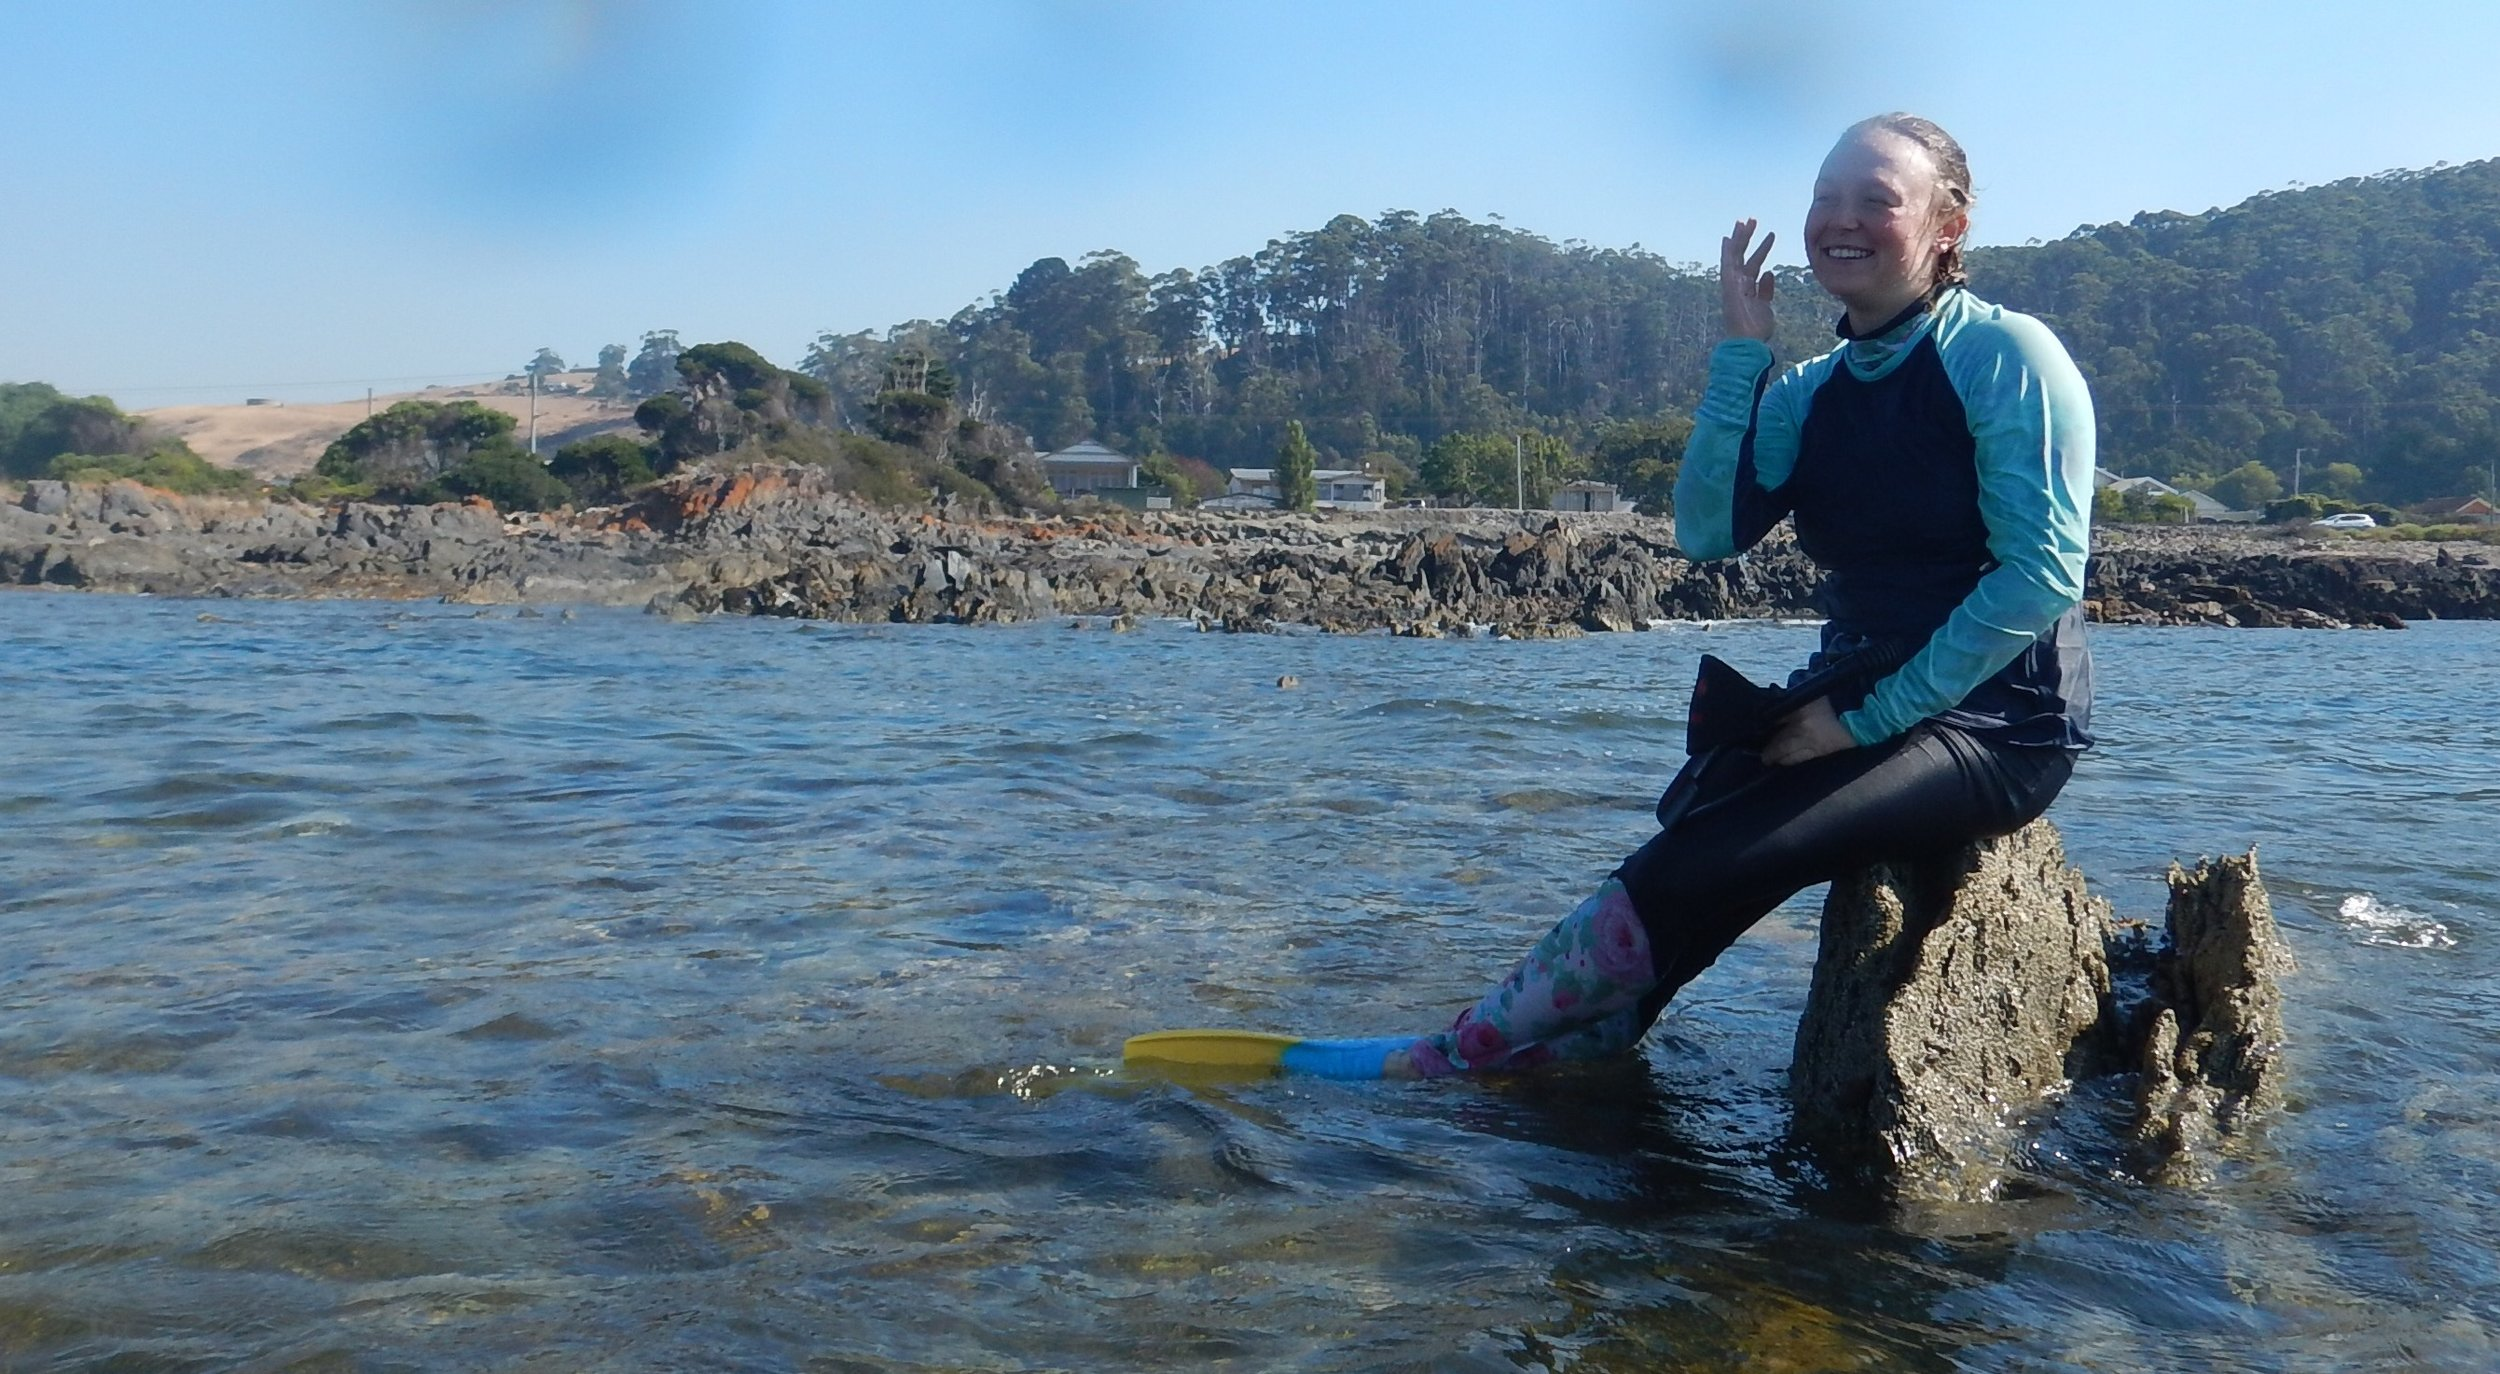 Mermaid on a rock!